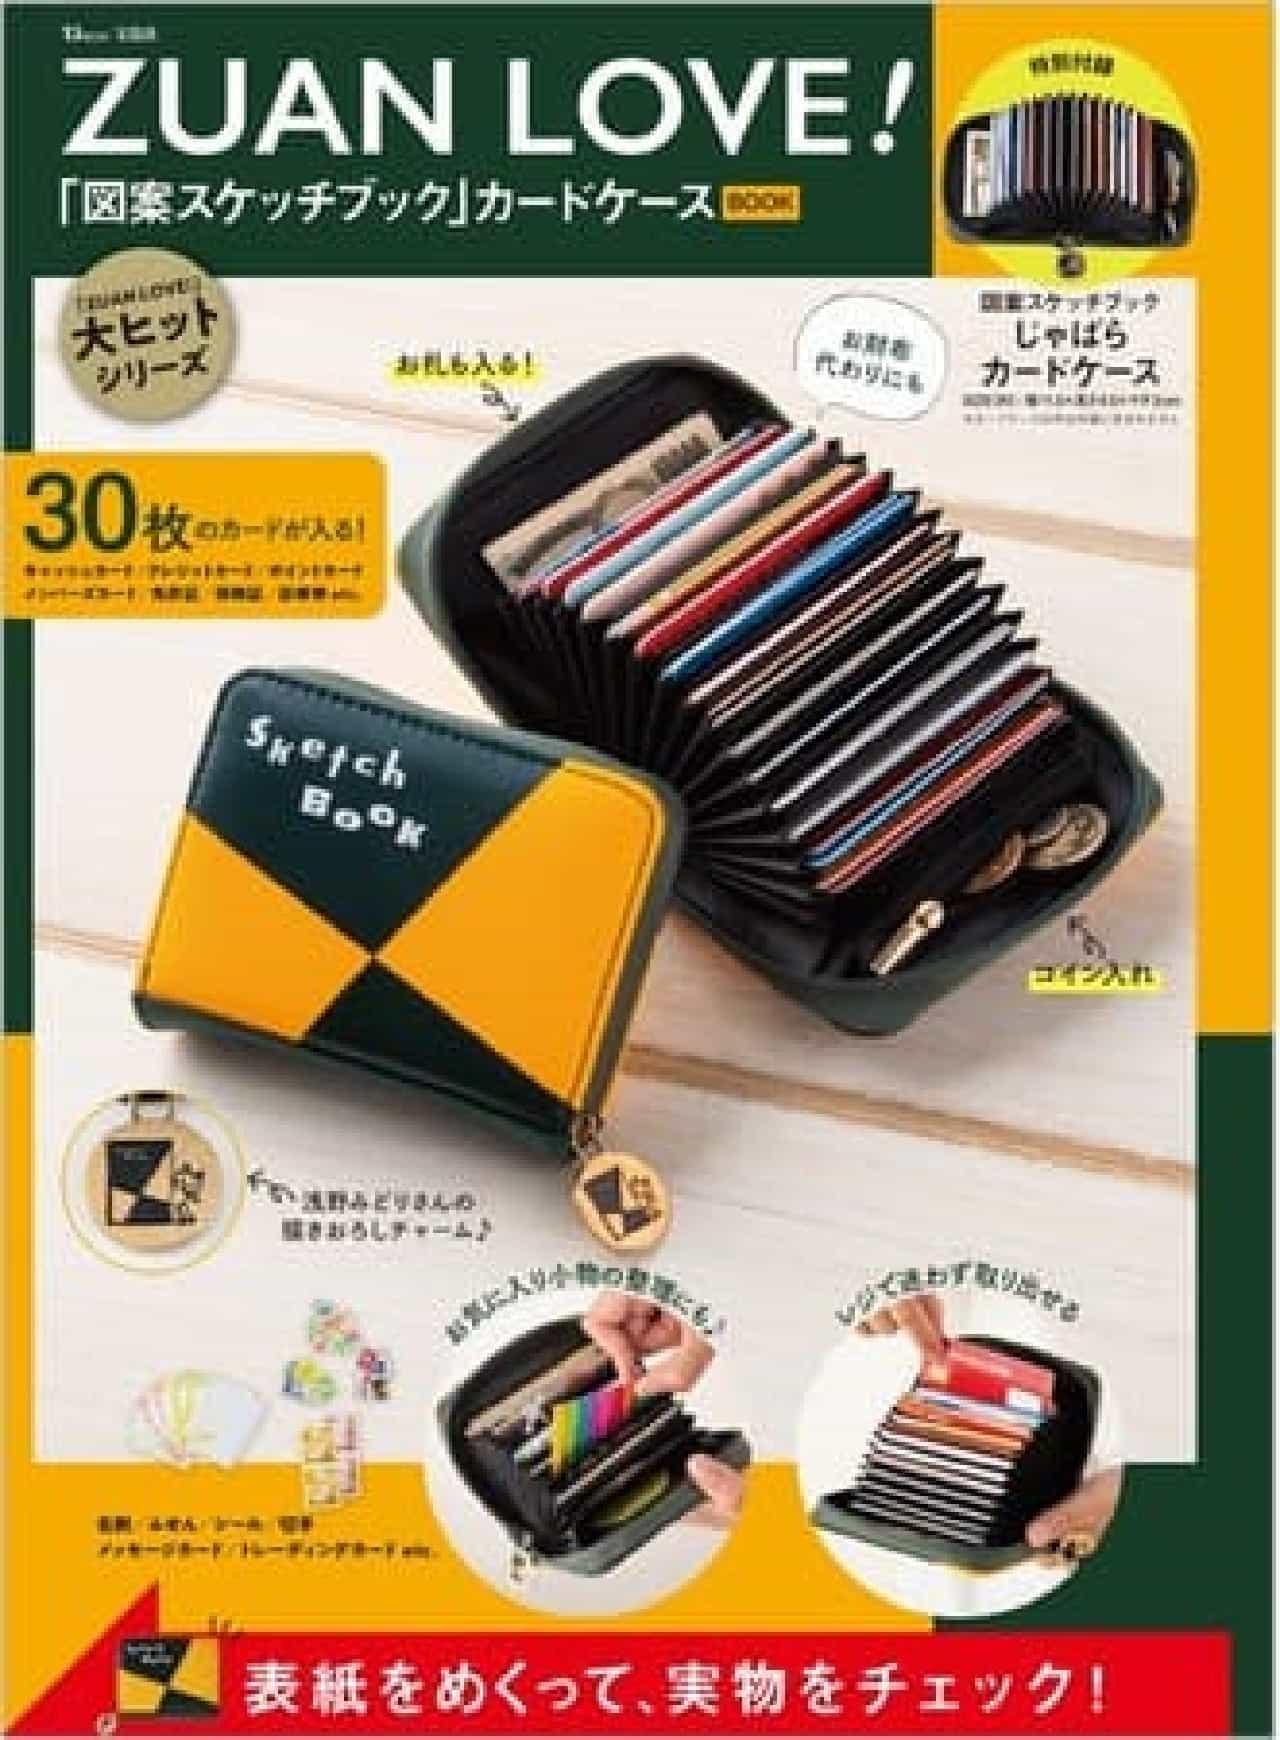 「ZUAN LOVE!『図案スケッチブック』カードケースBOOK」人気ロングセラーをデザインした付録